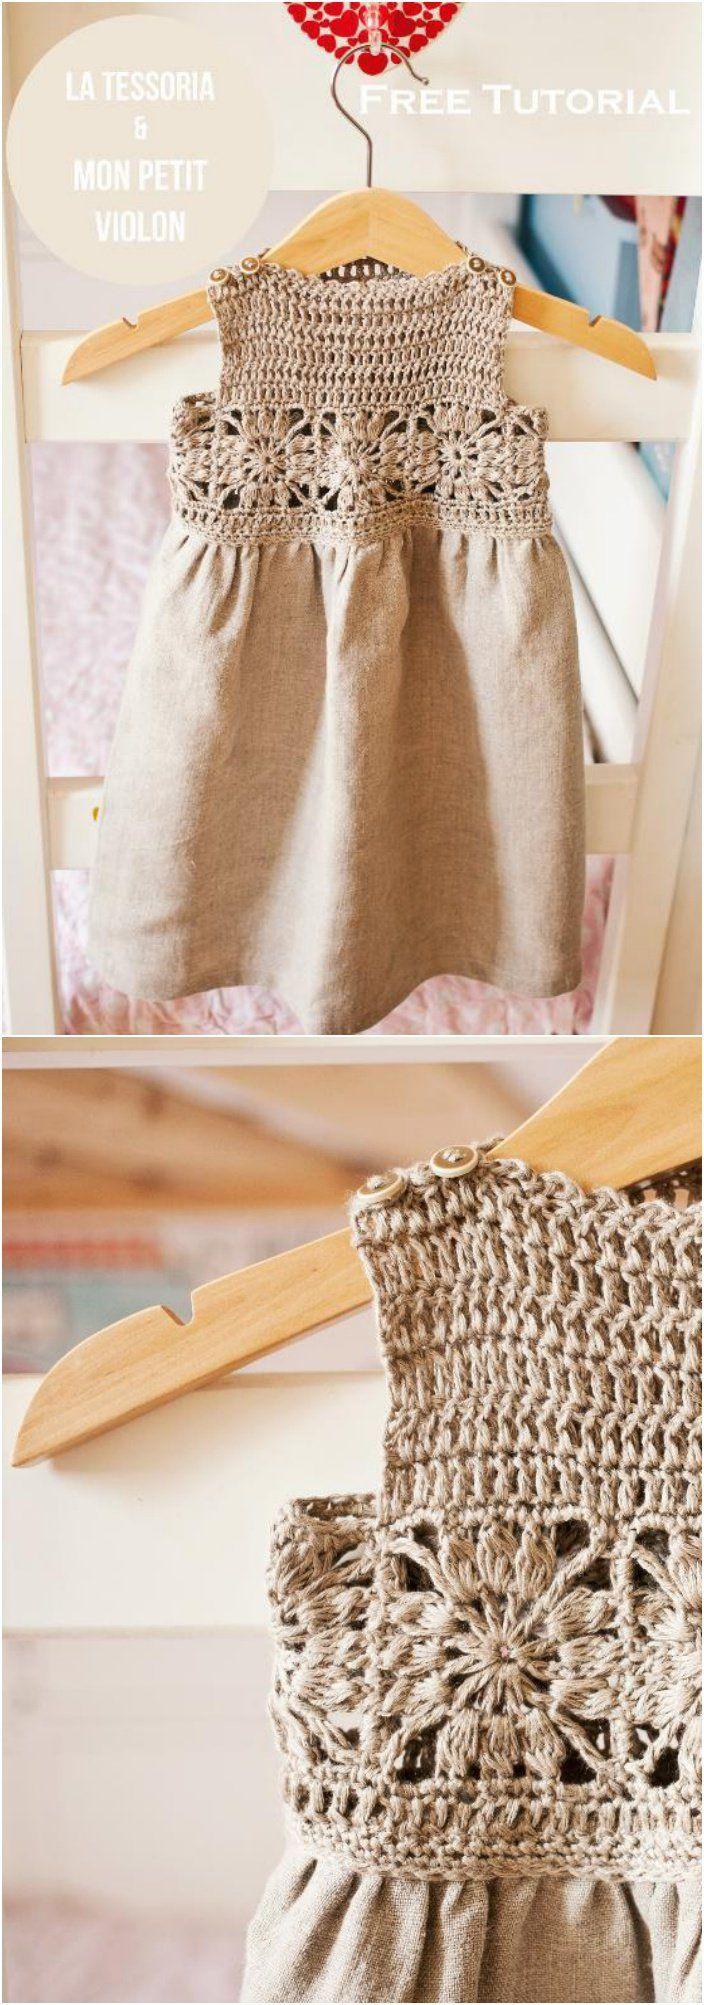 10+ Free Crochet and Fabric Dress Patterns | Nena, Lindo y Tejido